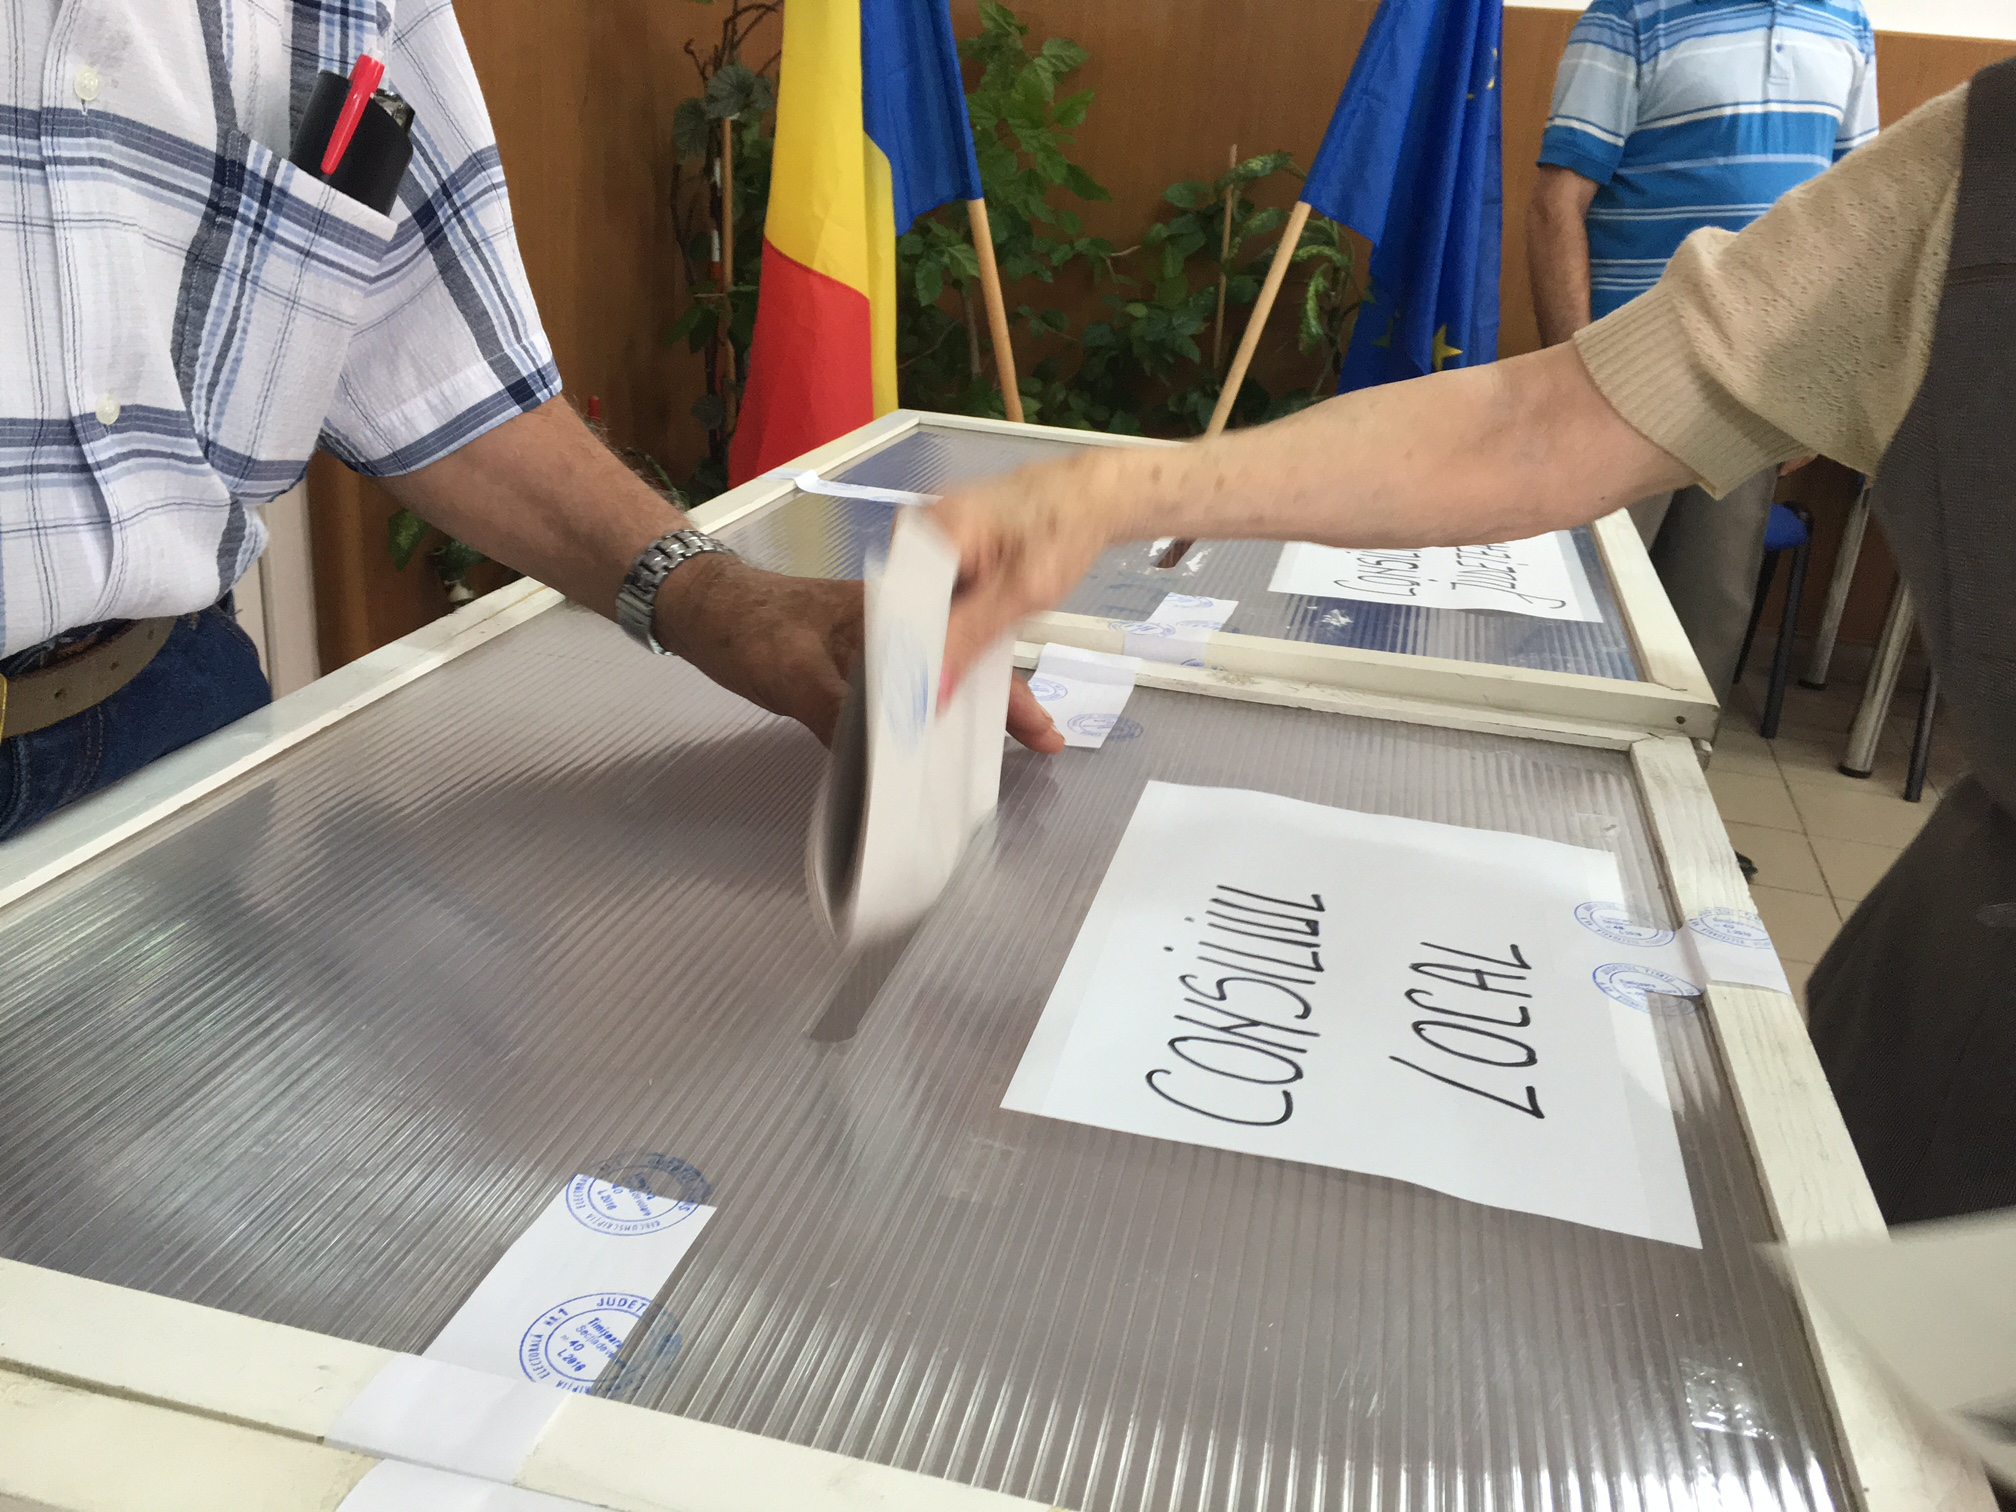 vot generic